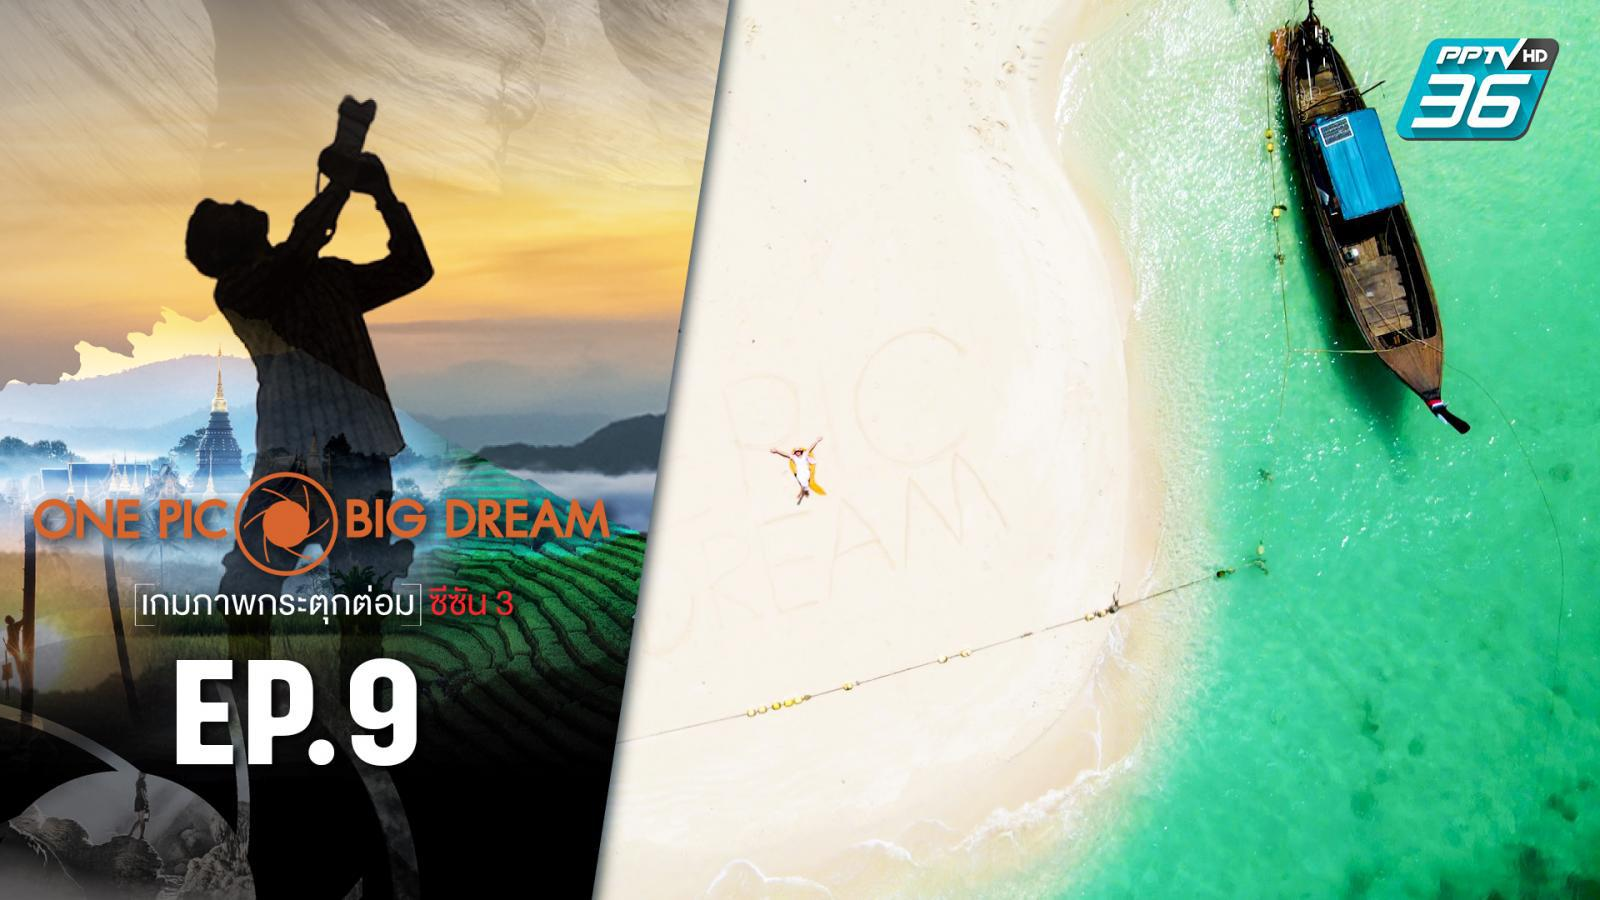 ONE PIC BIG DREAM เกมภาพกระตุกต่อม ซีซัน 3 EP.9 | 3 มี.ค. 64 | PPTV HD 36